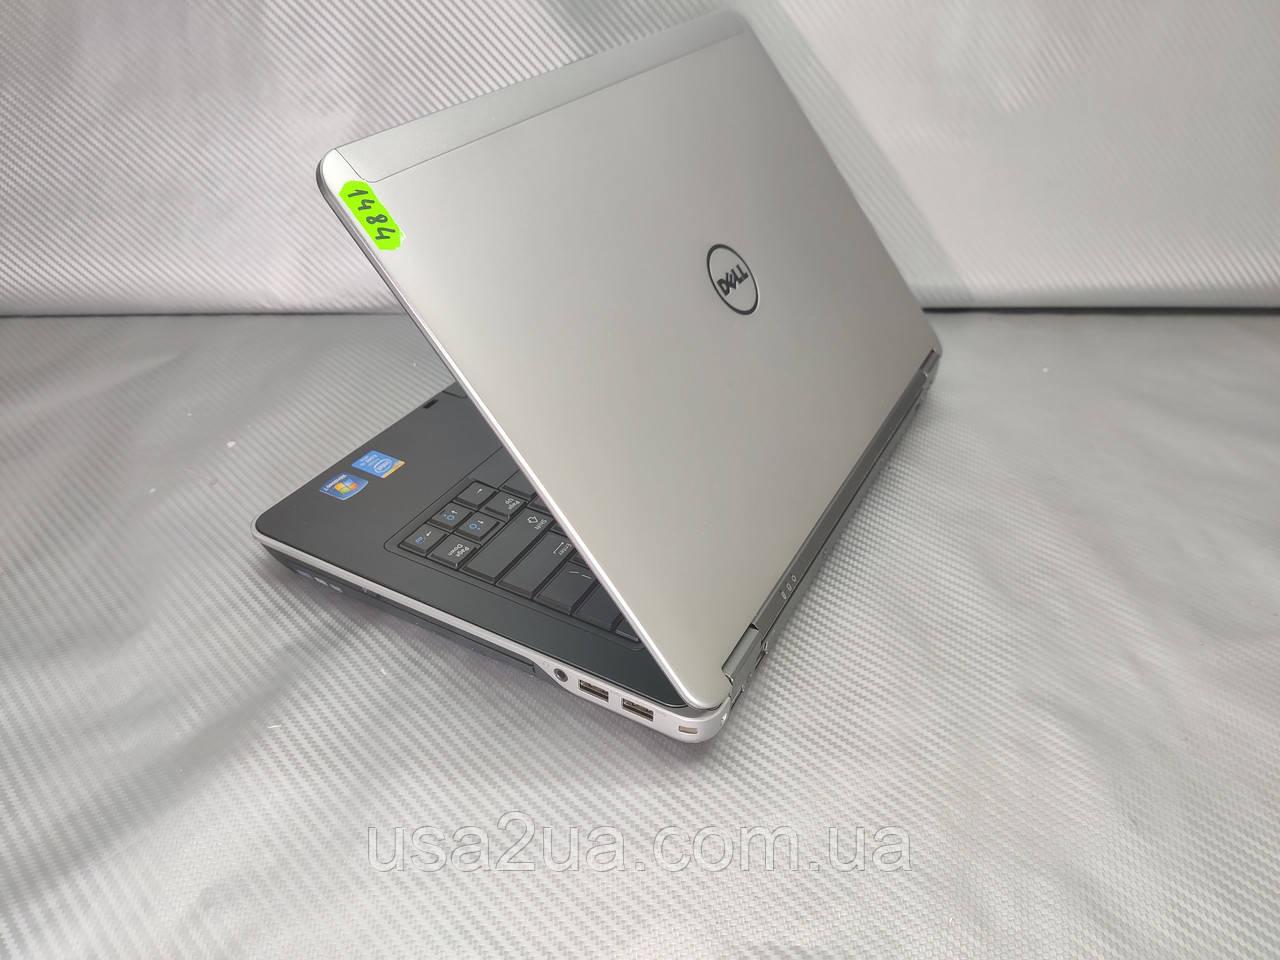 Потужний Ноутбук Dell Latitude E6440 Core i5 4Gen 500gb 4Gb WEB cam Кредит Гарантія Доставка